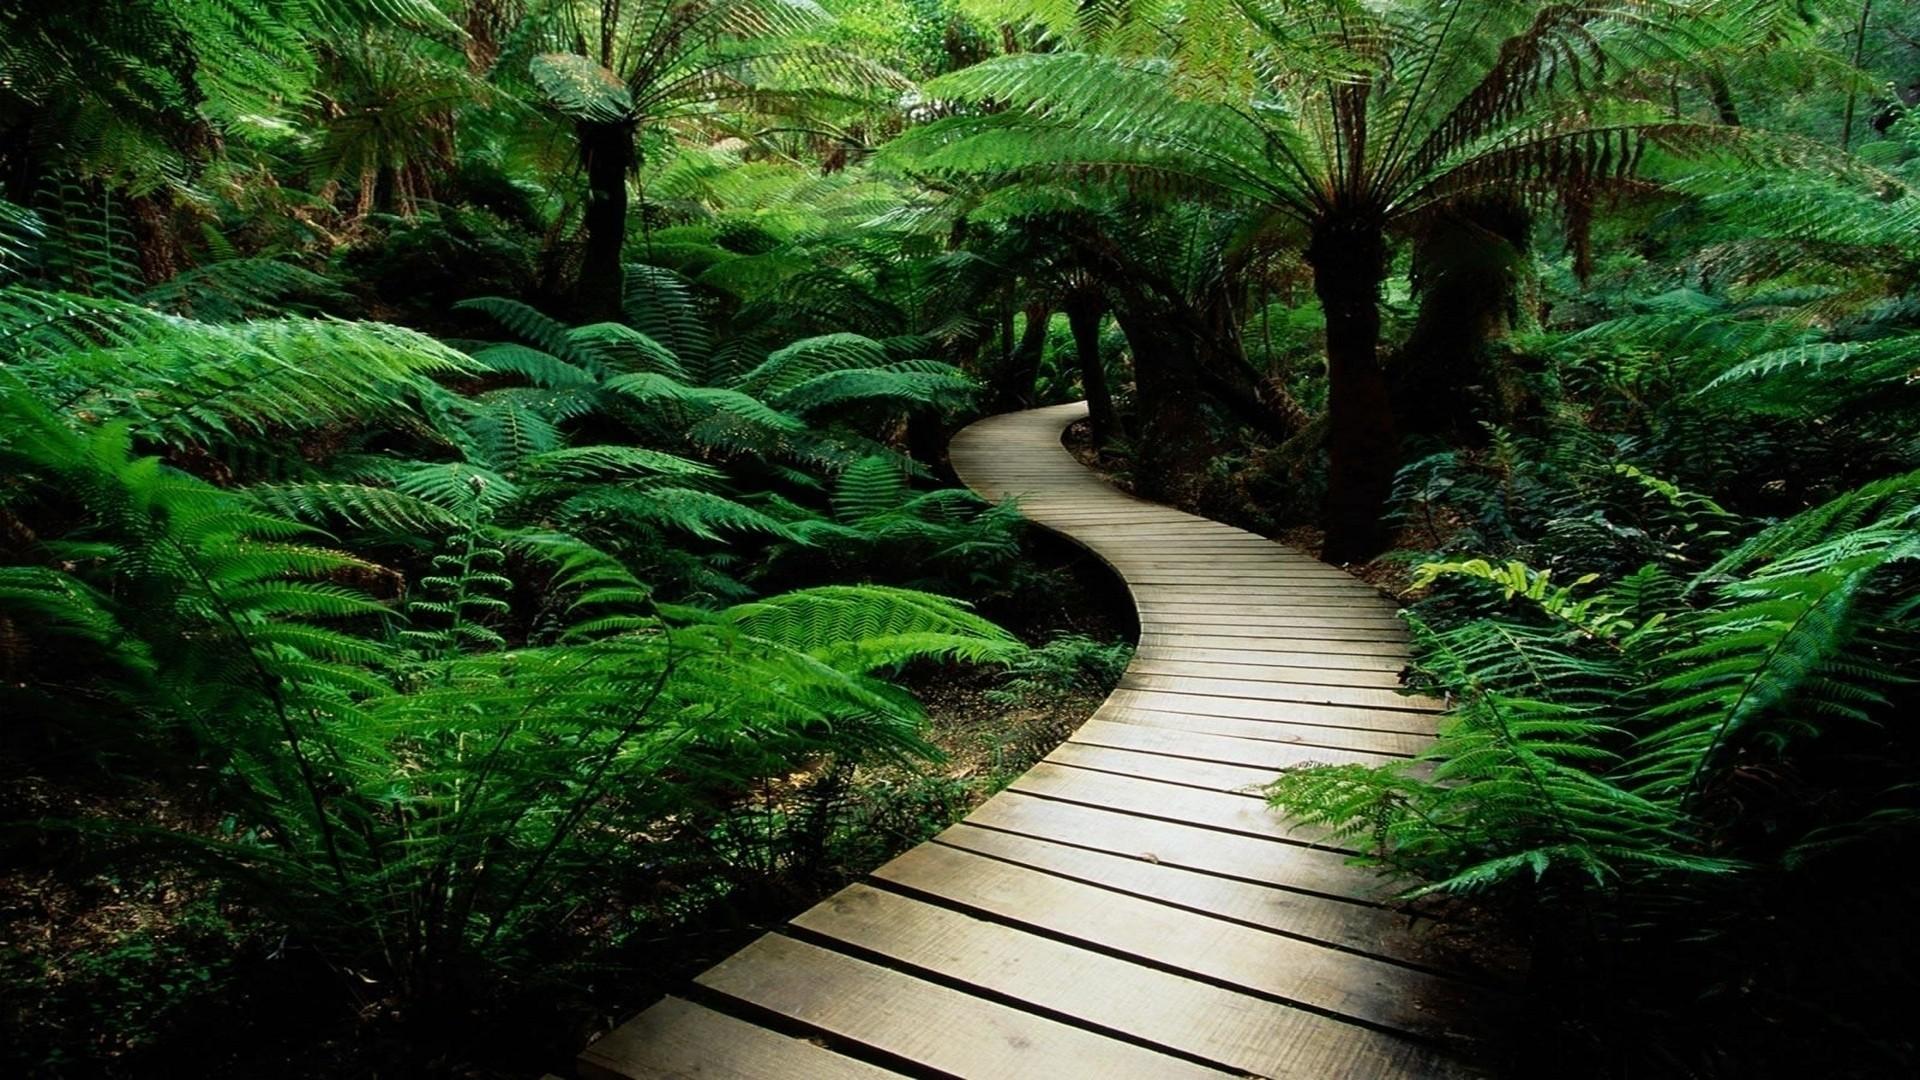 876878-rainforest-wallpaper.jpg